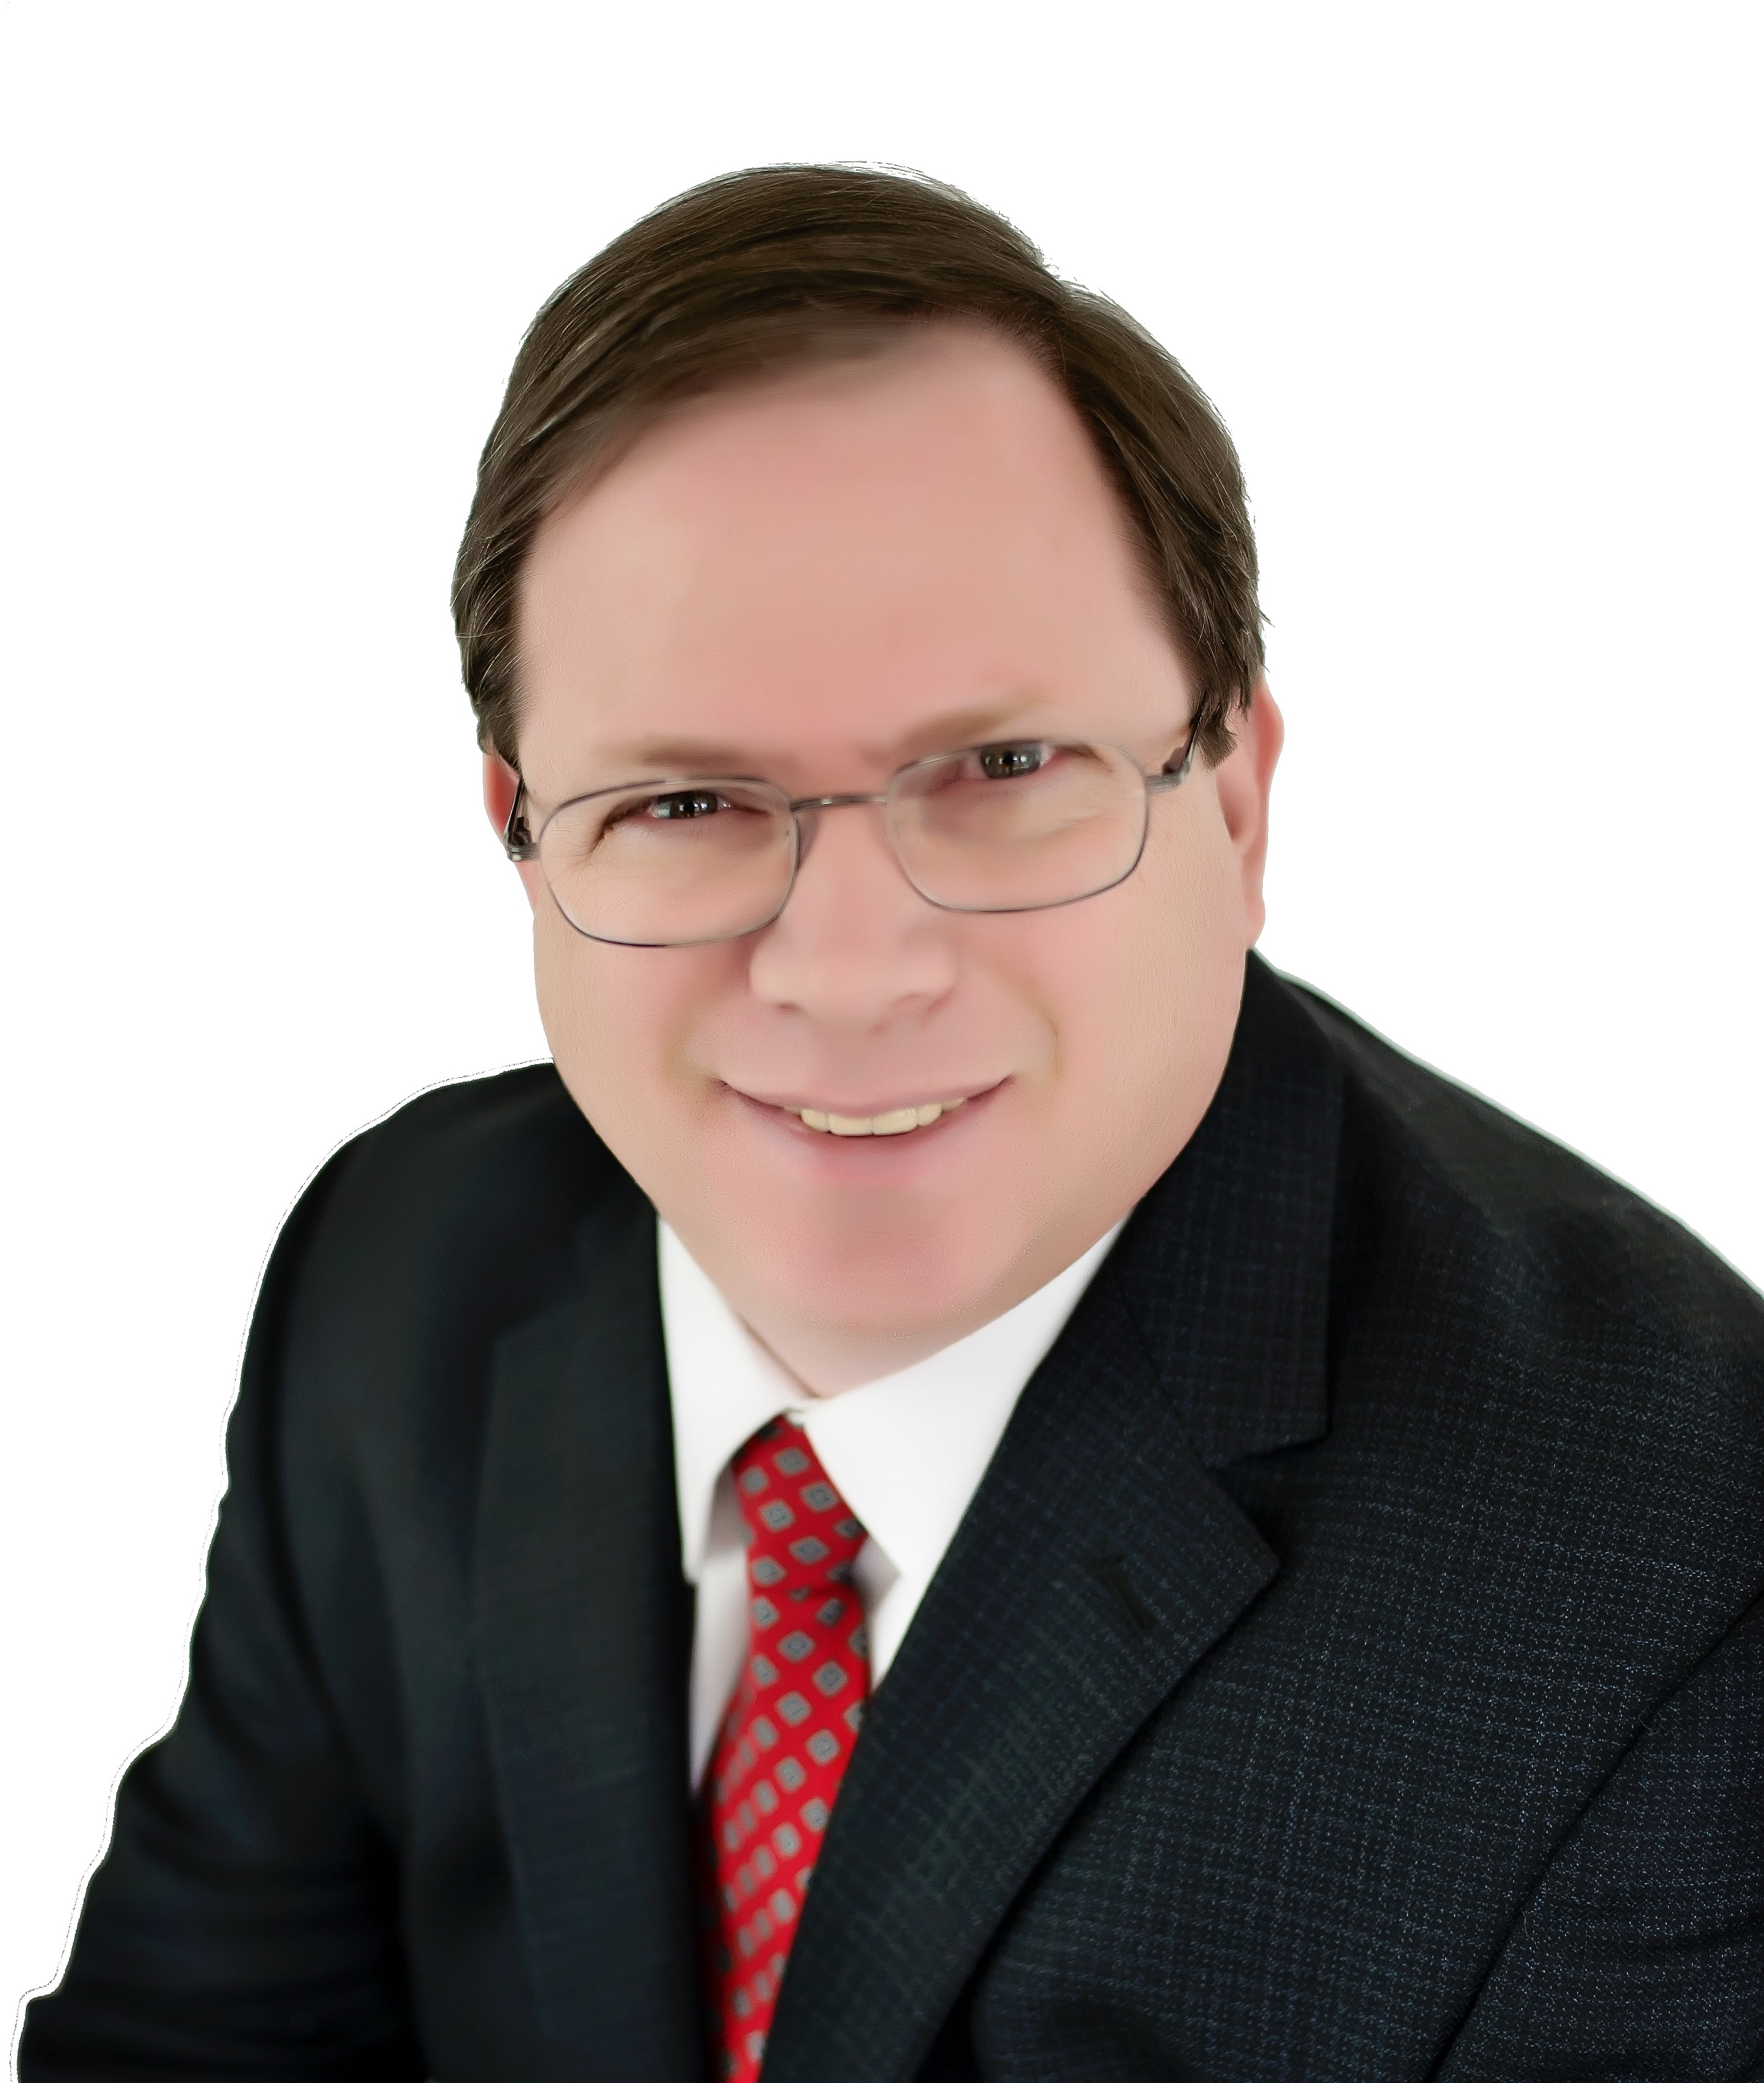 Dave Halpern Realtor